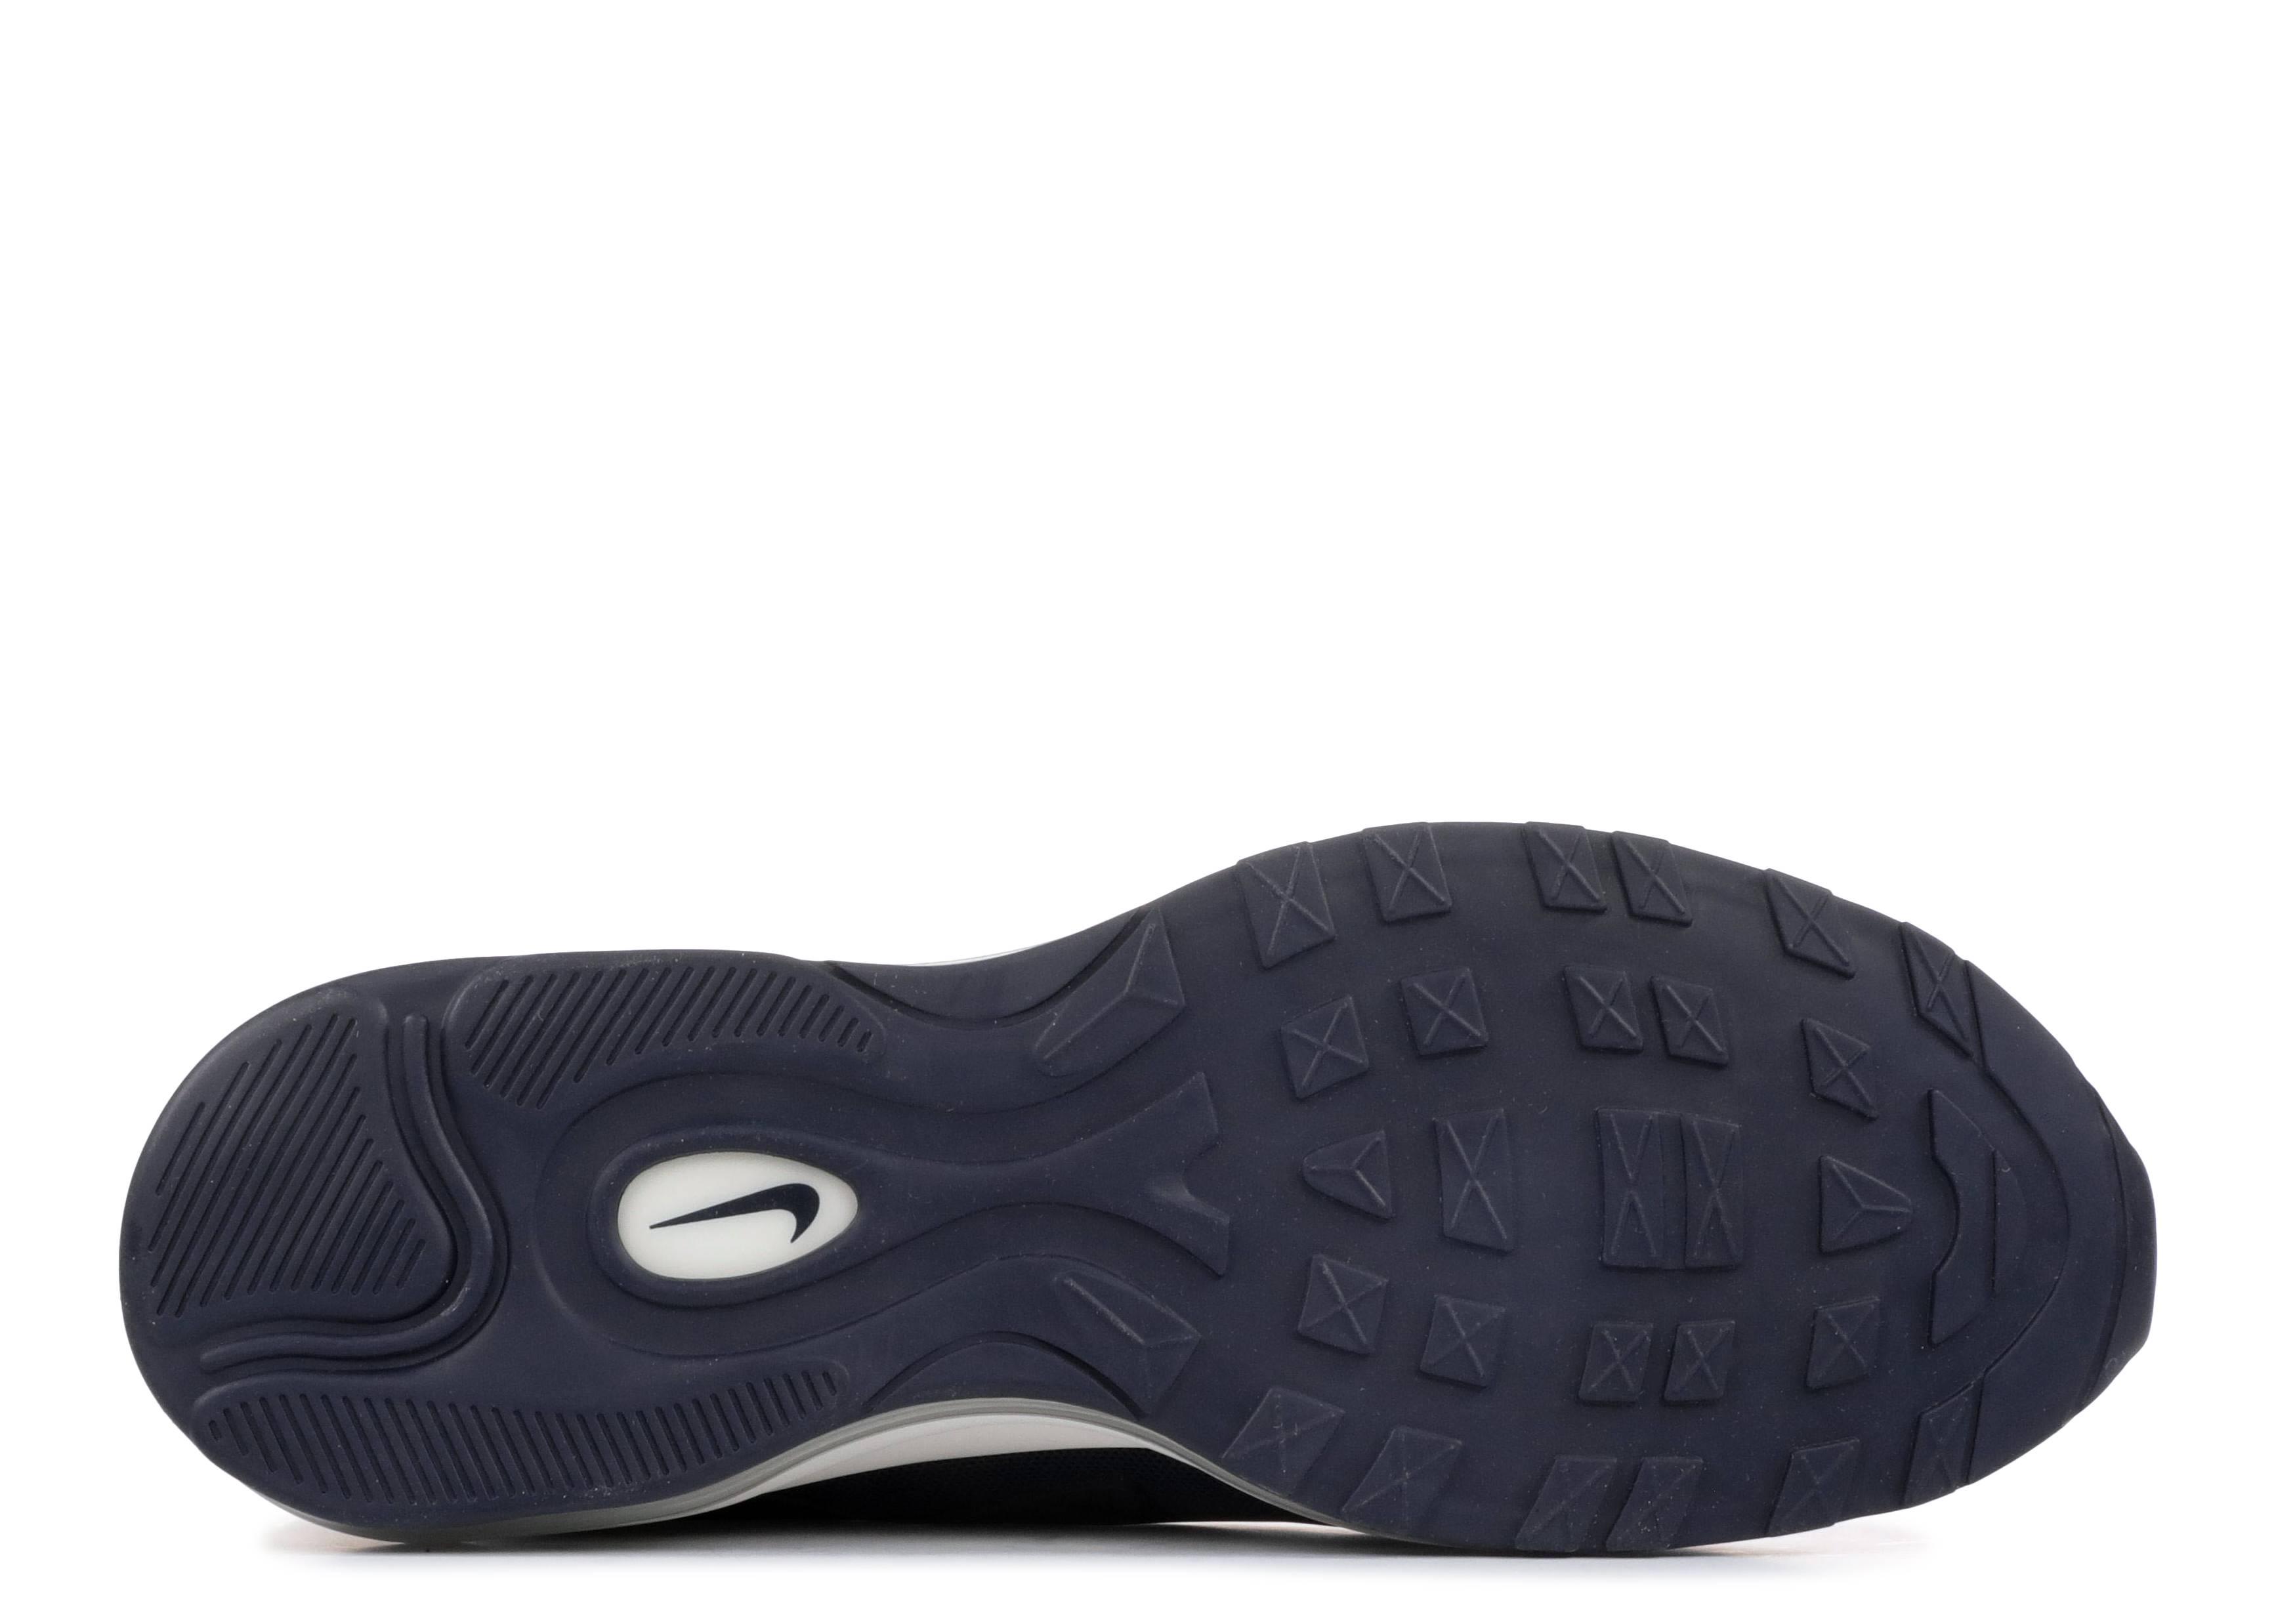 Nike Air Max 97 UL 17 PRM Ultra Navy Obsidian Sail Shoes AH7581 400